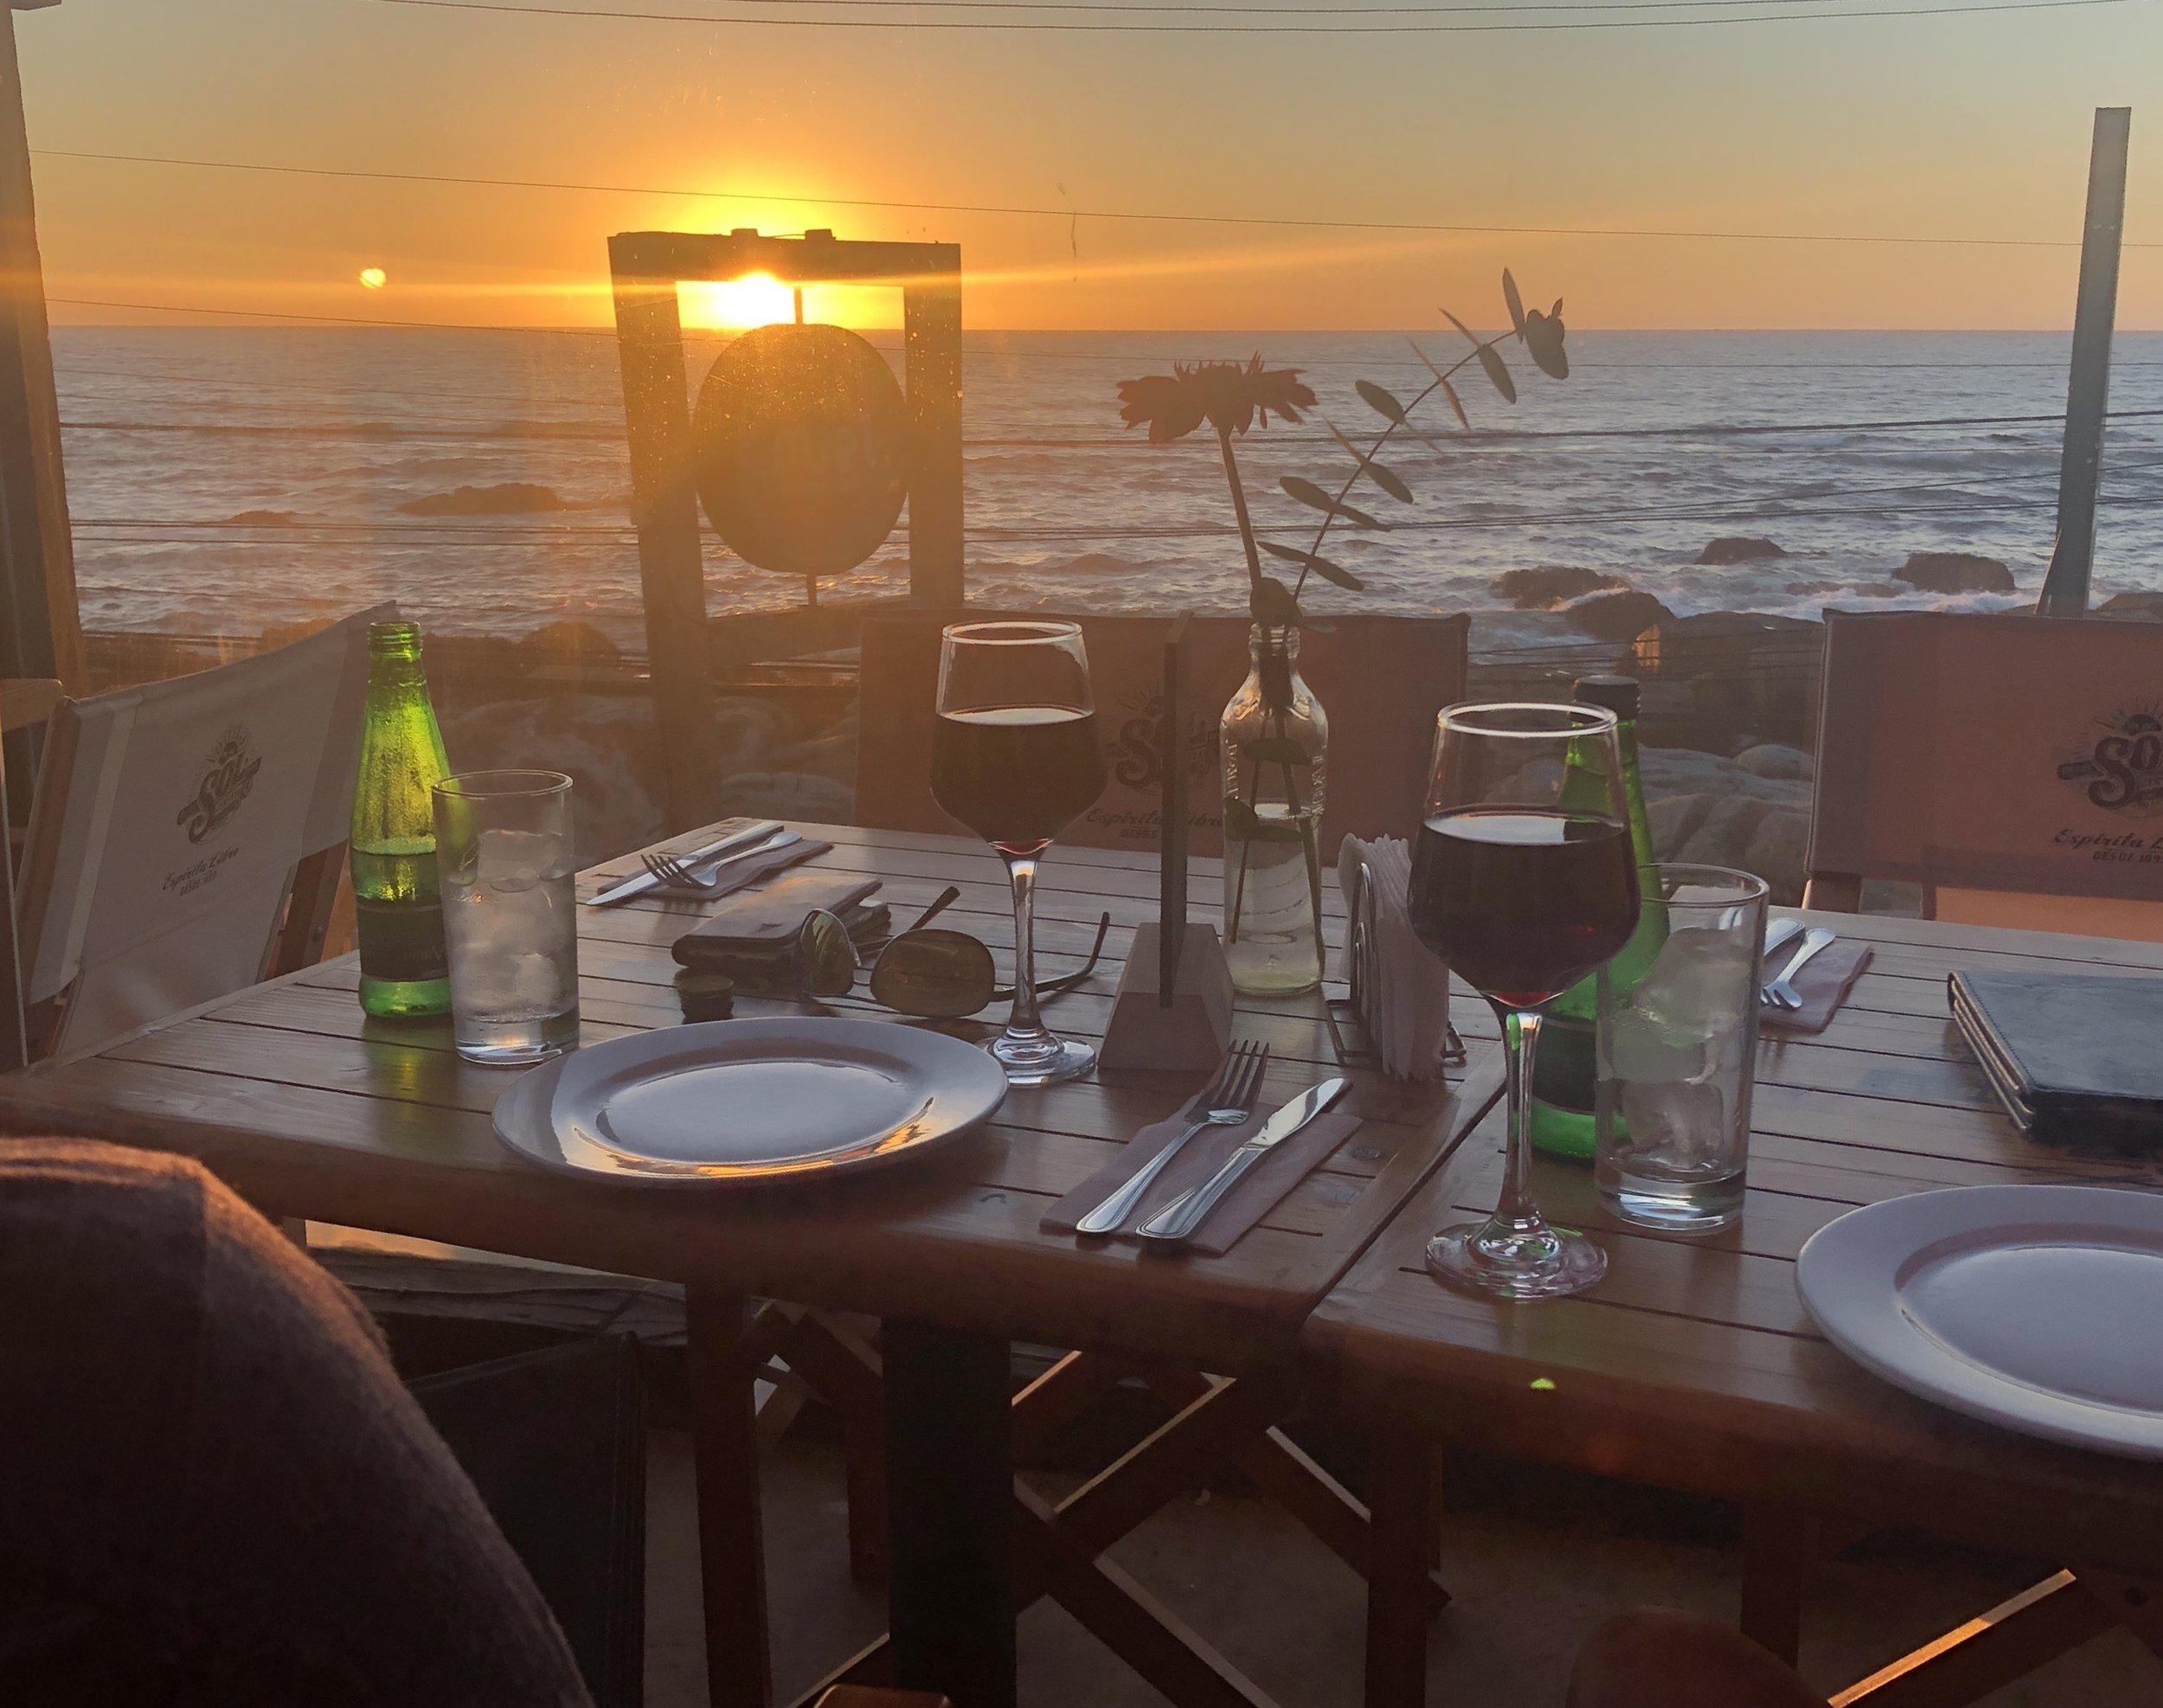 fish dinner table good.jpg